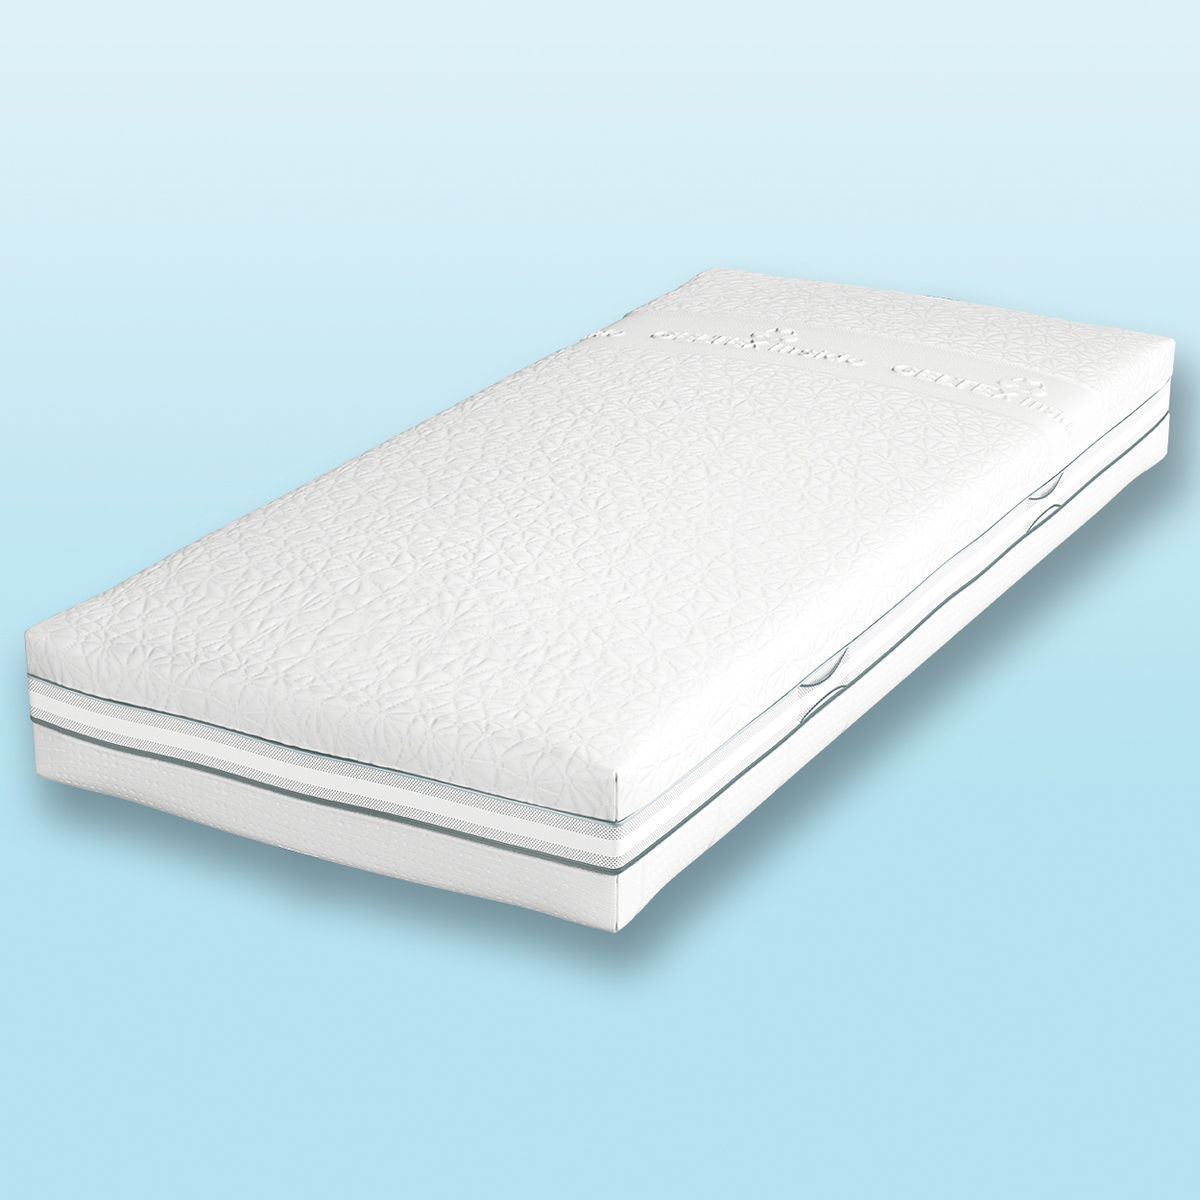 schlaraffia platin 240 geltex inside. Black Bedroom Furniture Sets. Home Design Ideas